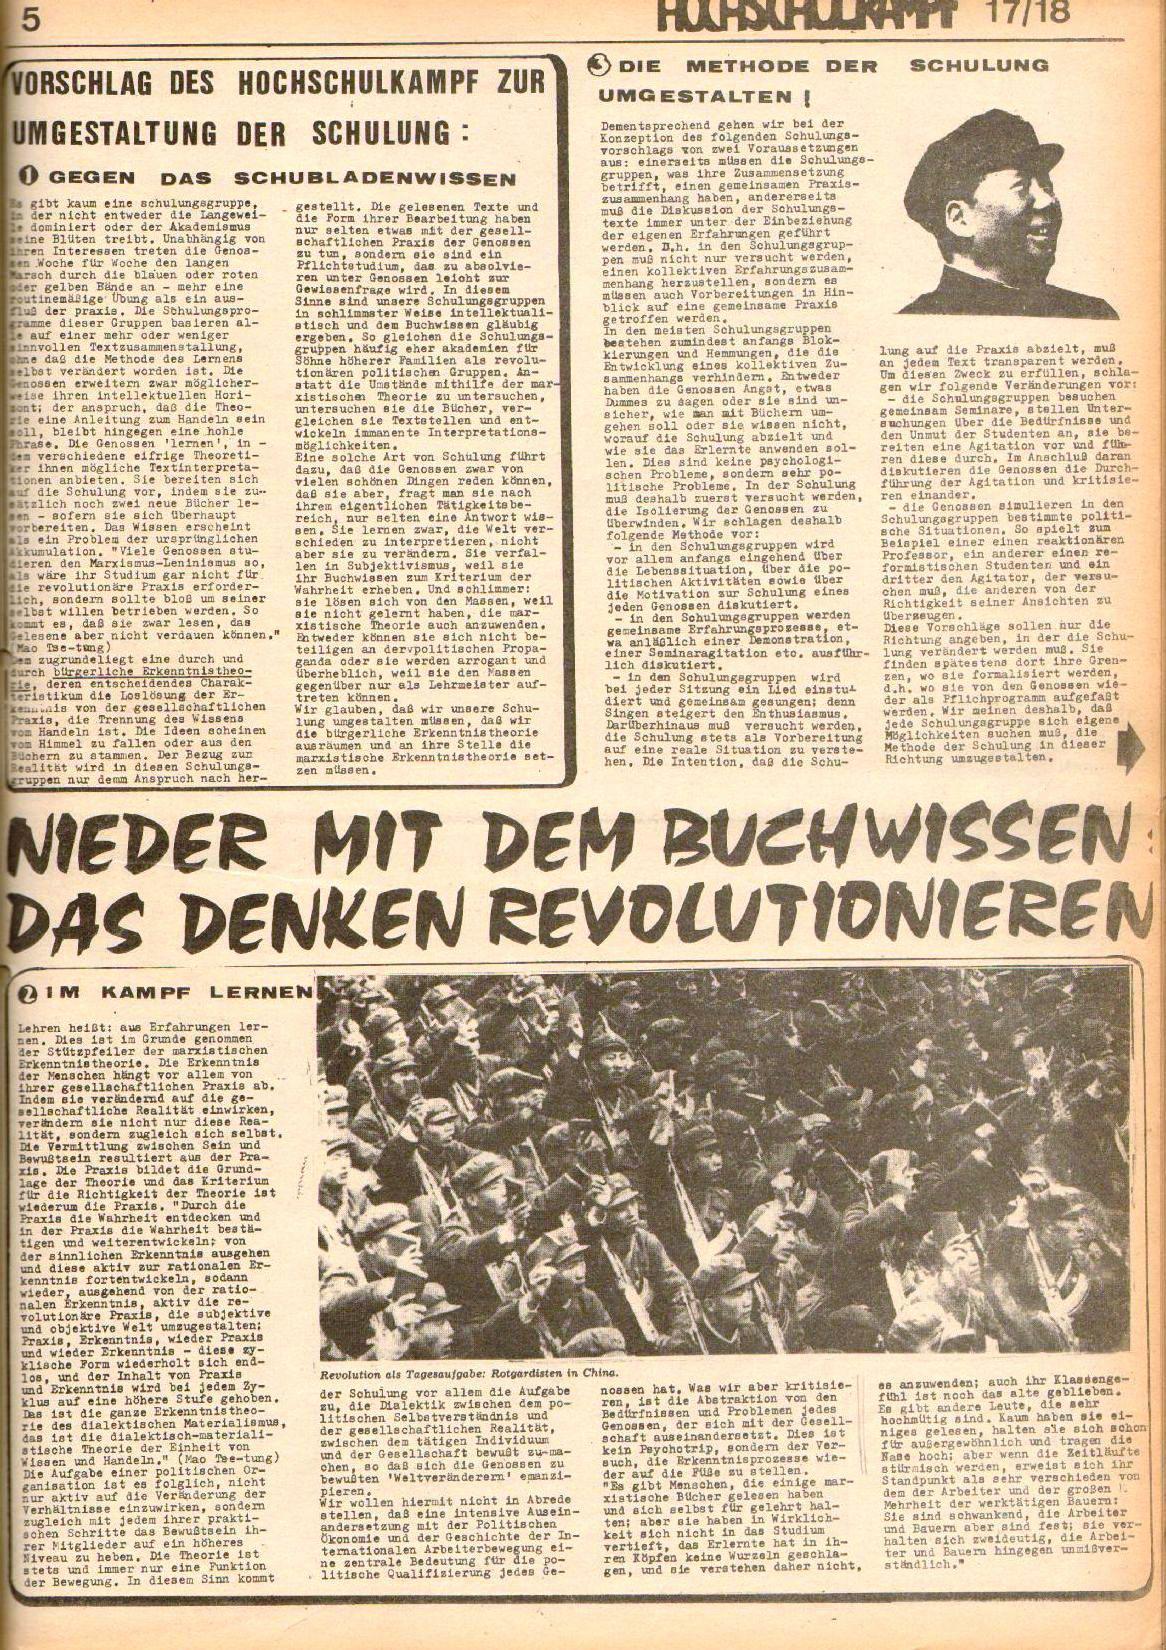 Berlin_Hochschulkampf_1971_17_05